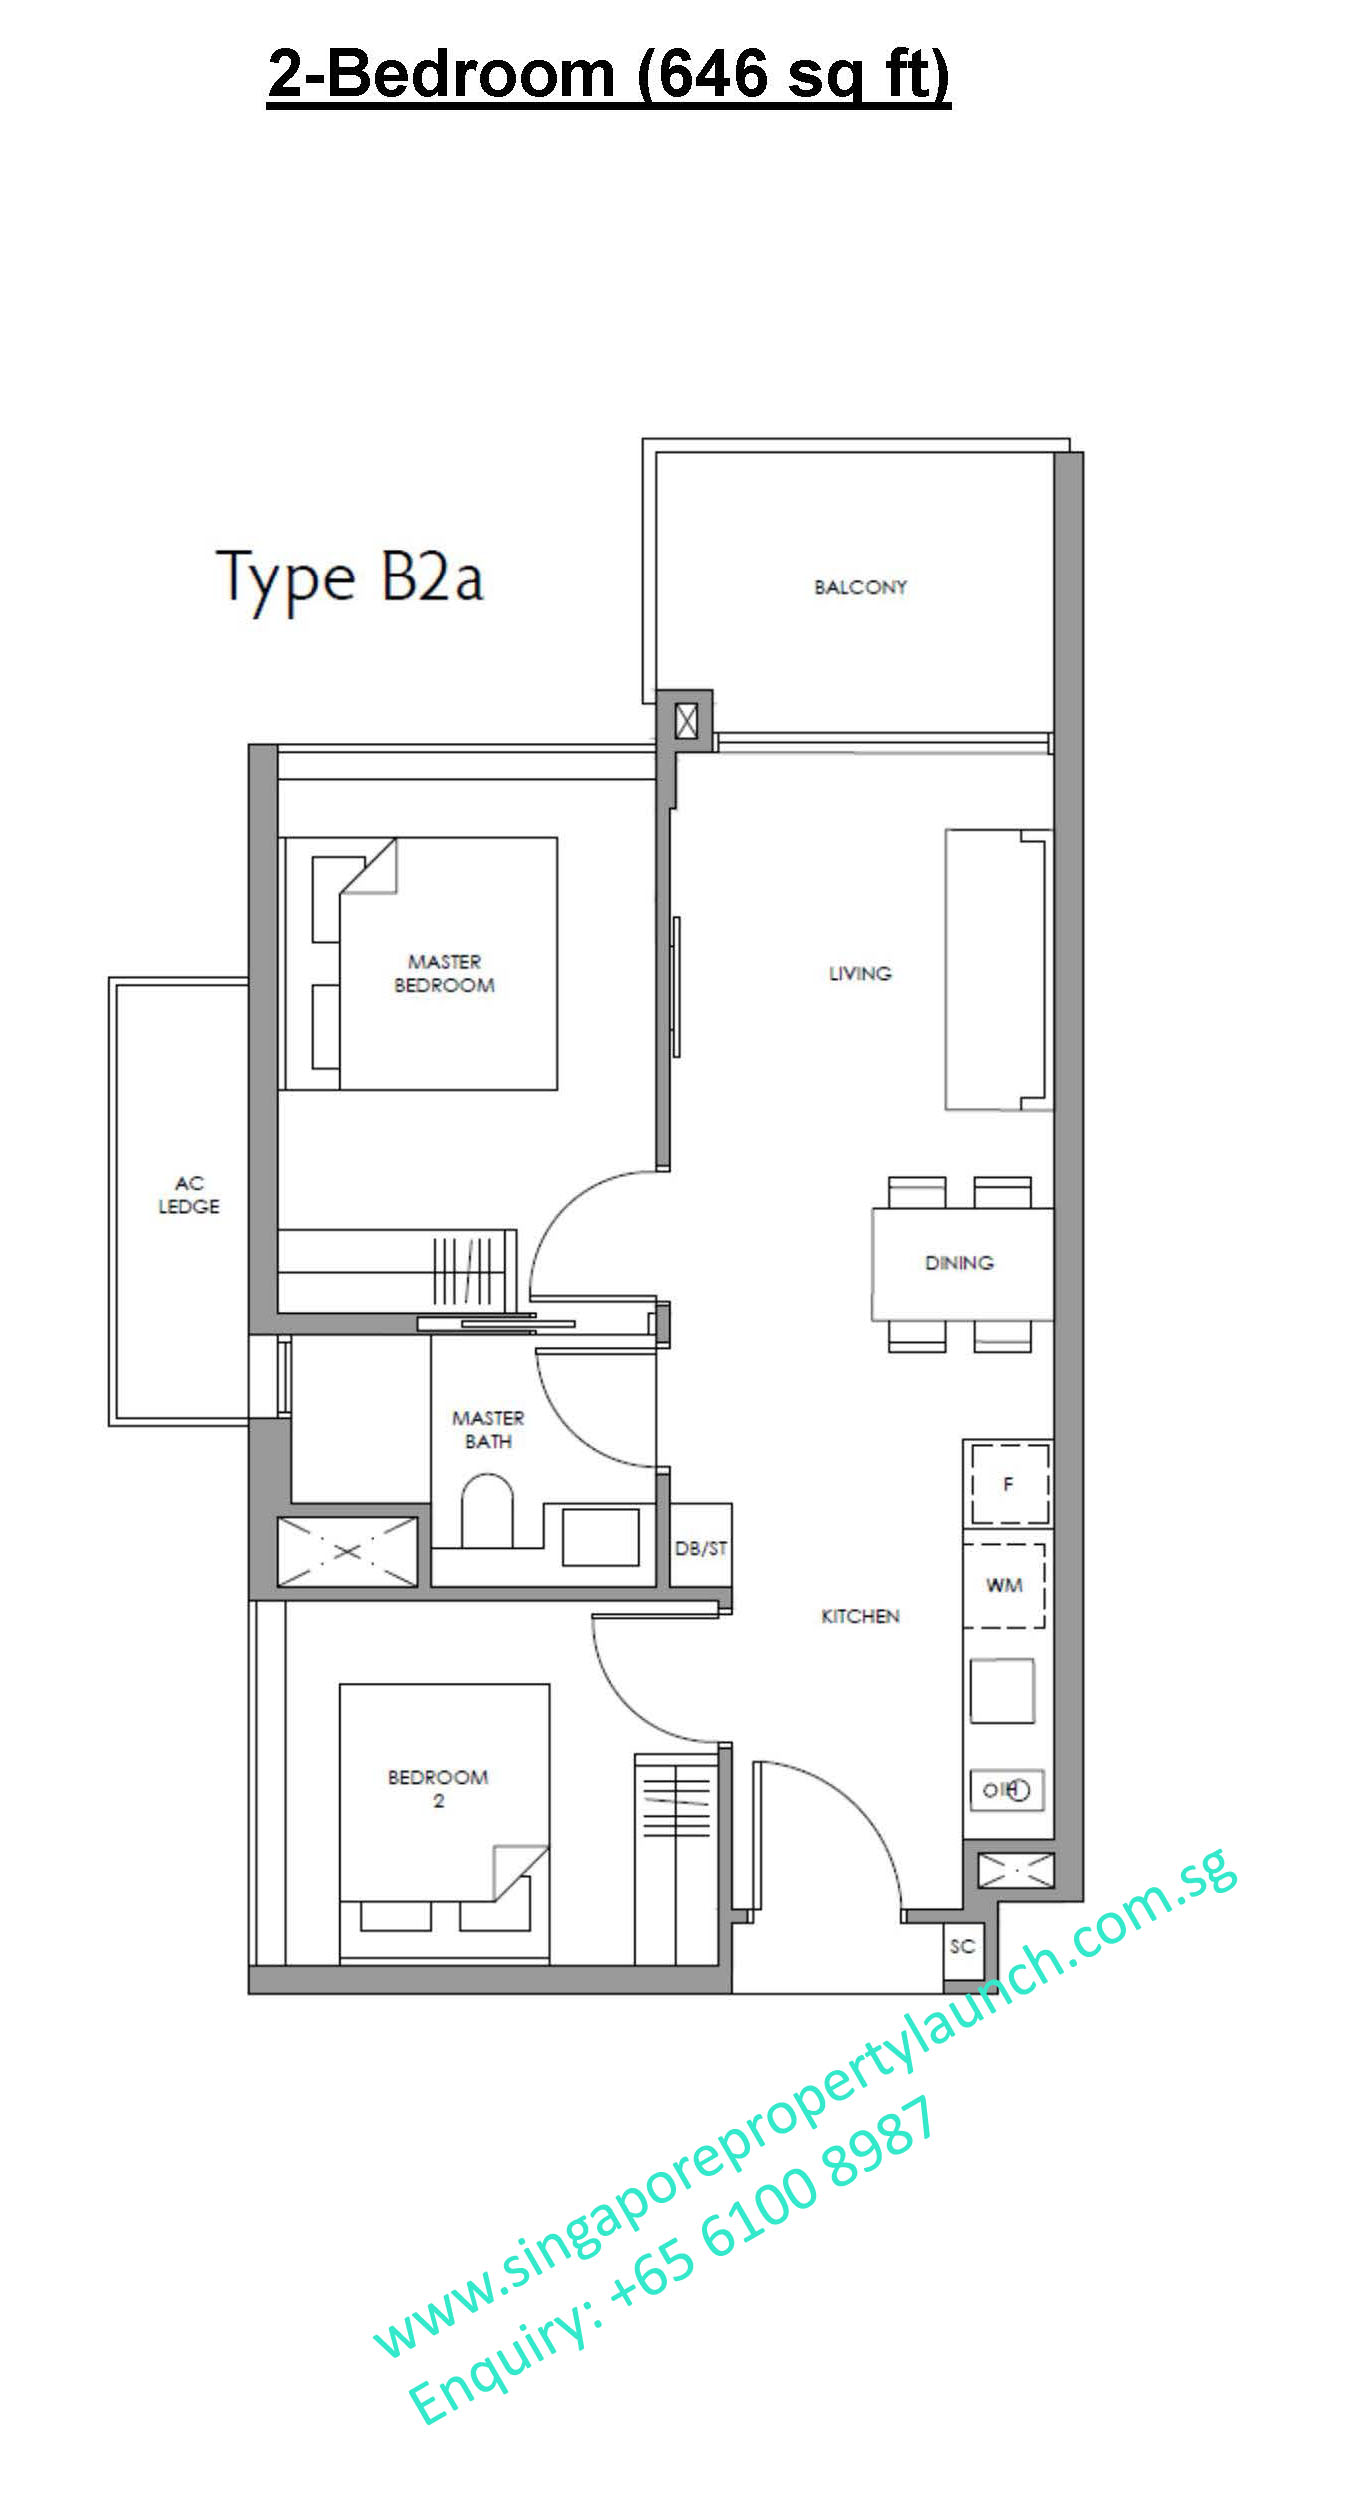 Fourth Avenue Residences floor plan 2